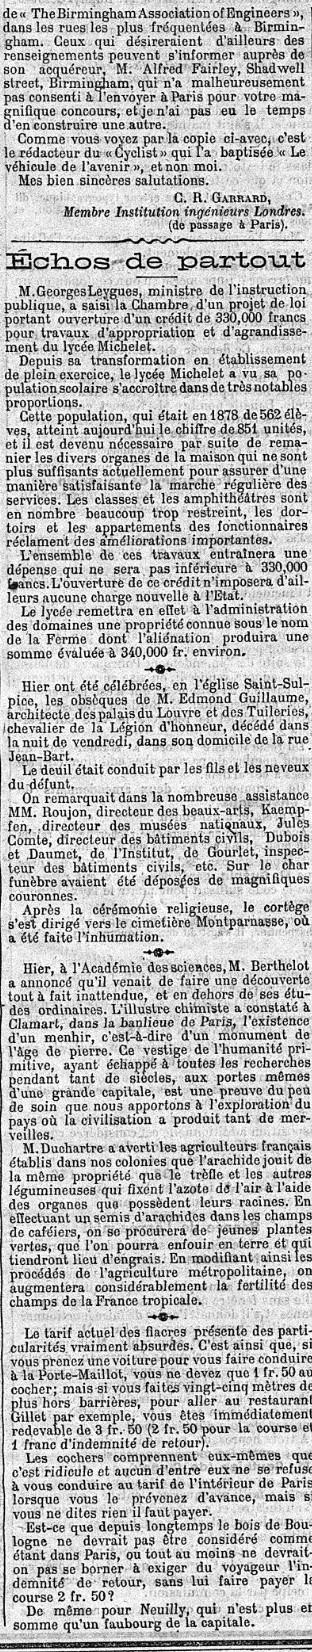 1894-07-24 3